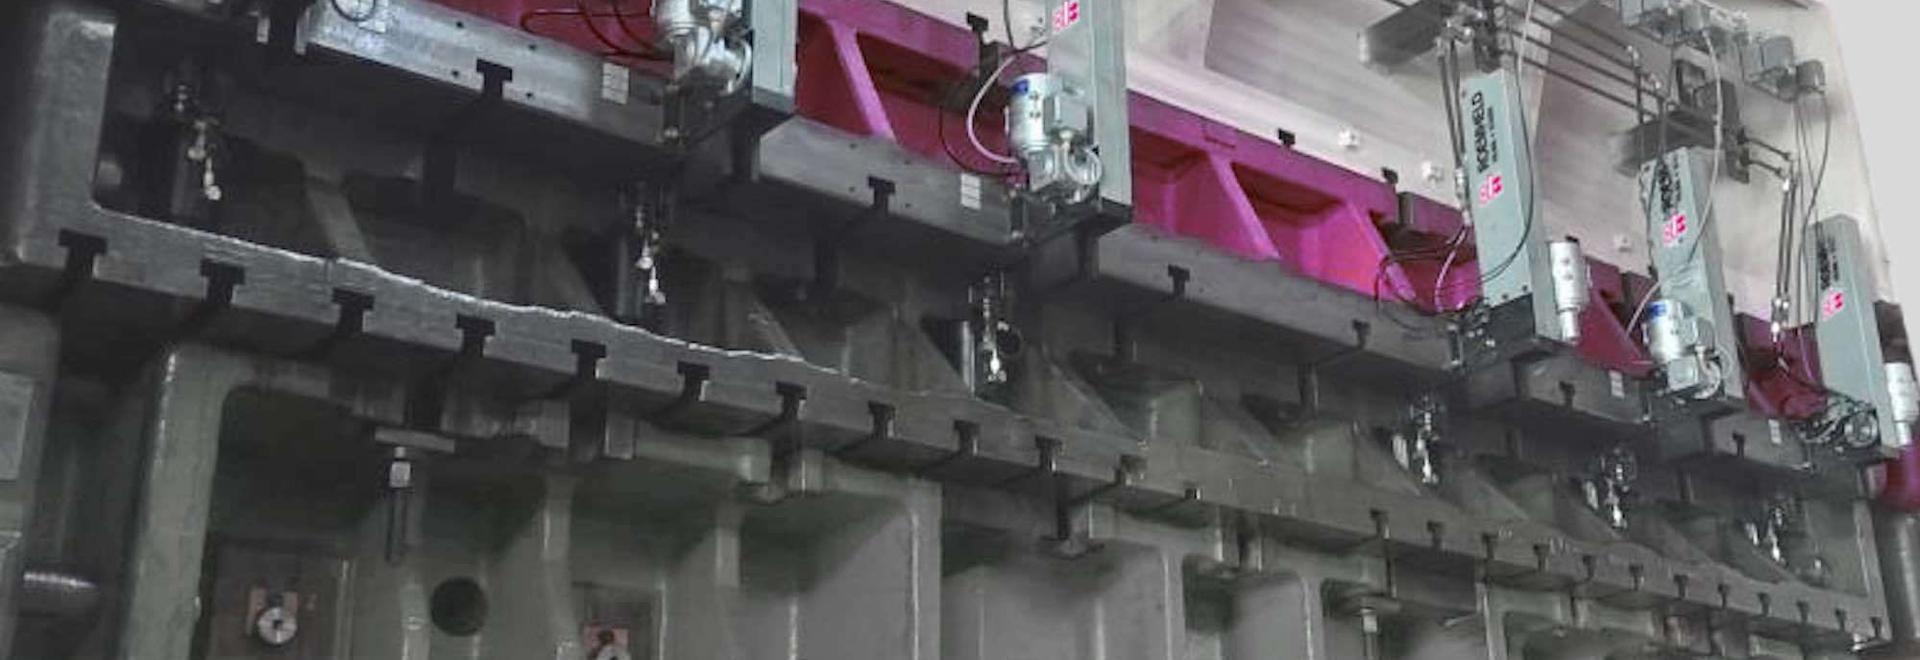 Système de serrage rapide Flexline